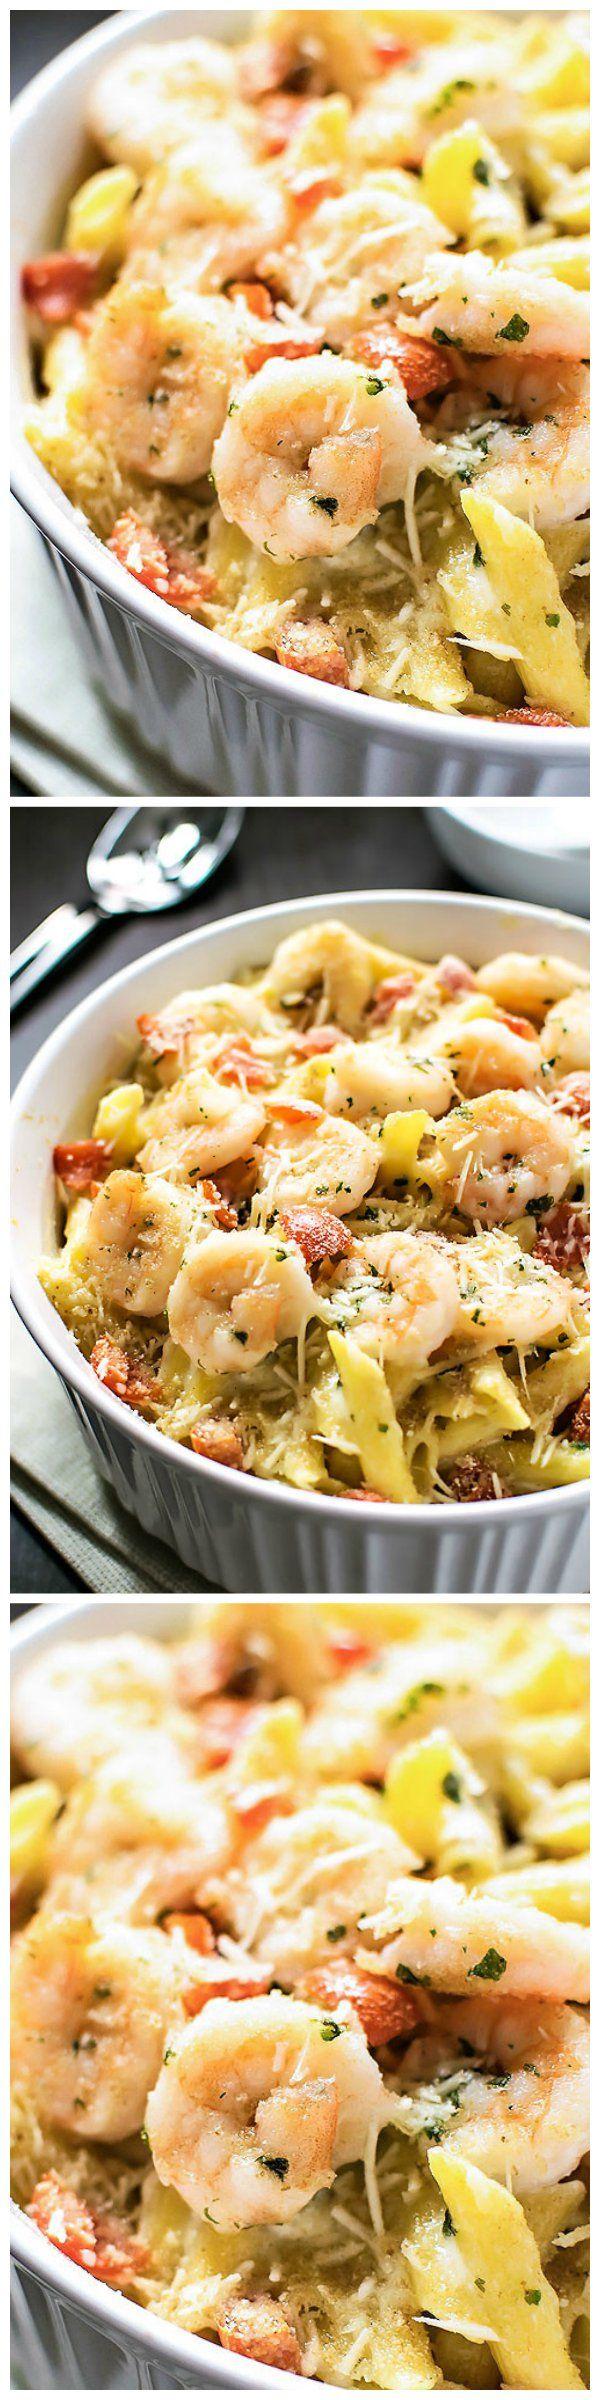 Baked parmesan shrimp bring the iconic taste of olive garden 39 s baked parmesan shrimp to the for Olive garden create your own pasta